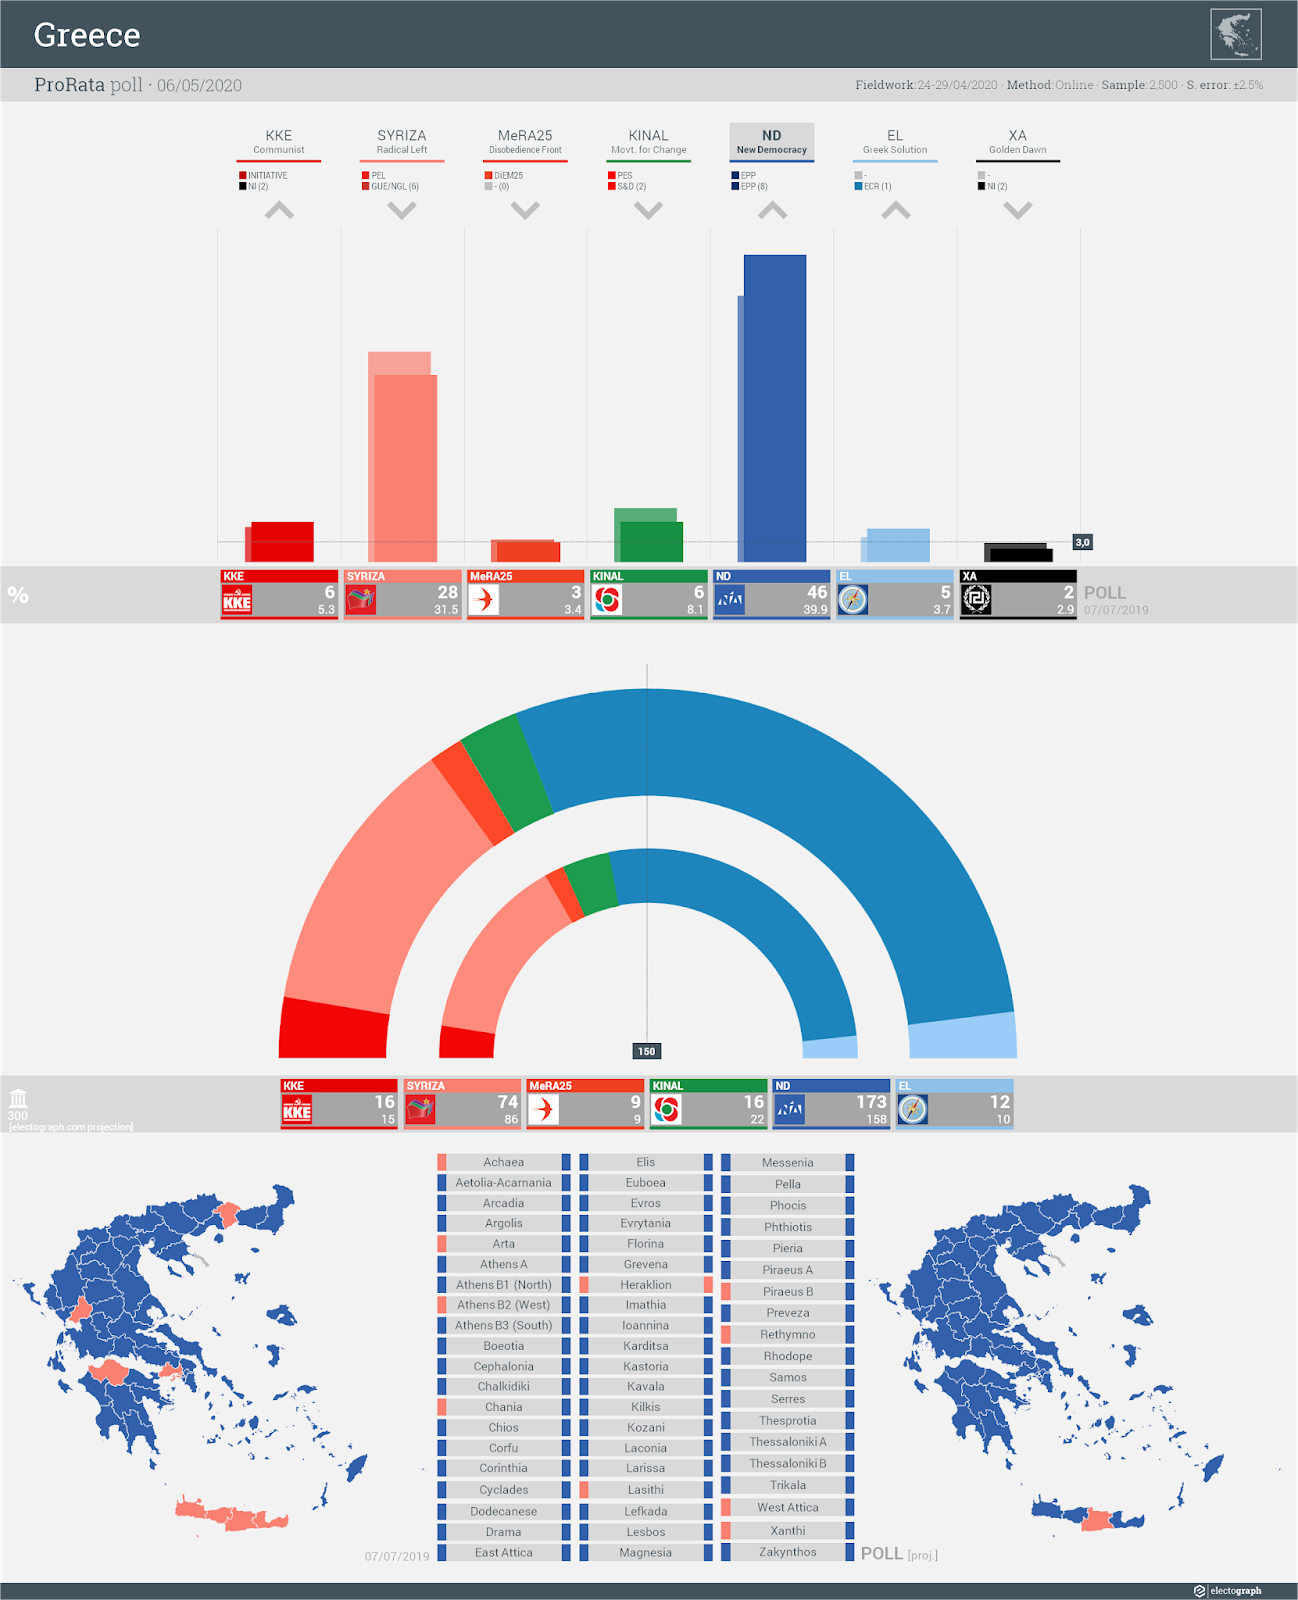 GREECE: ProRata poll chart, 6 May 2020